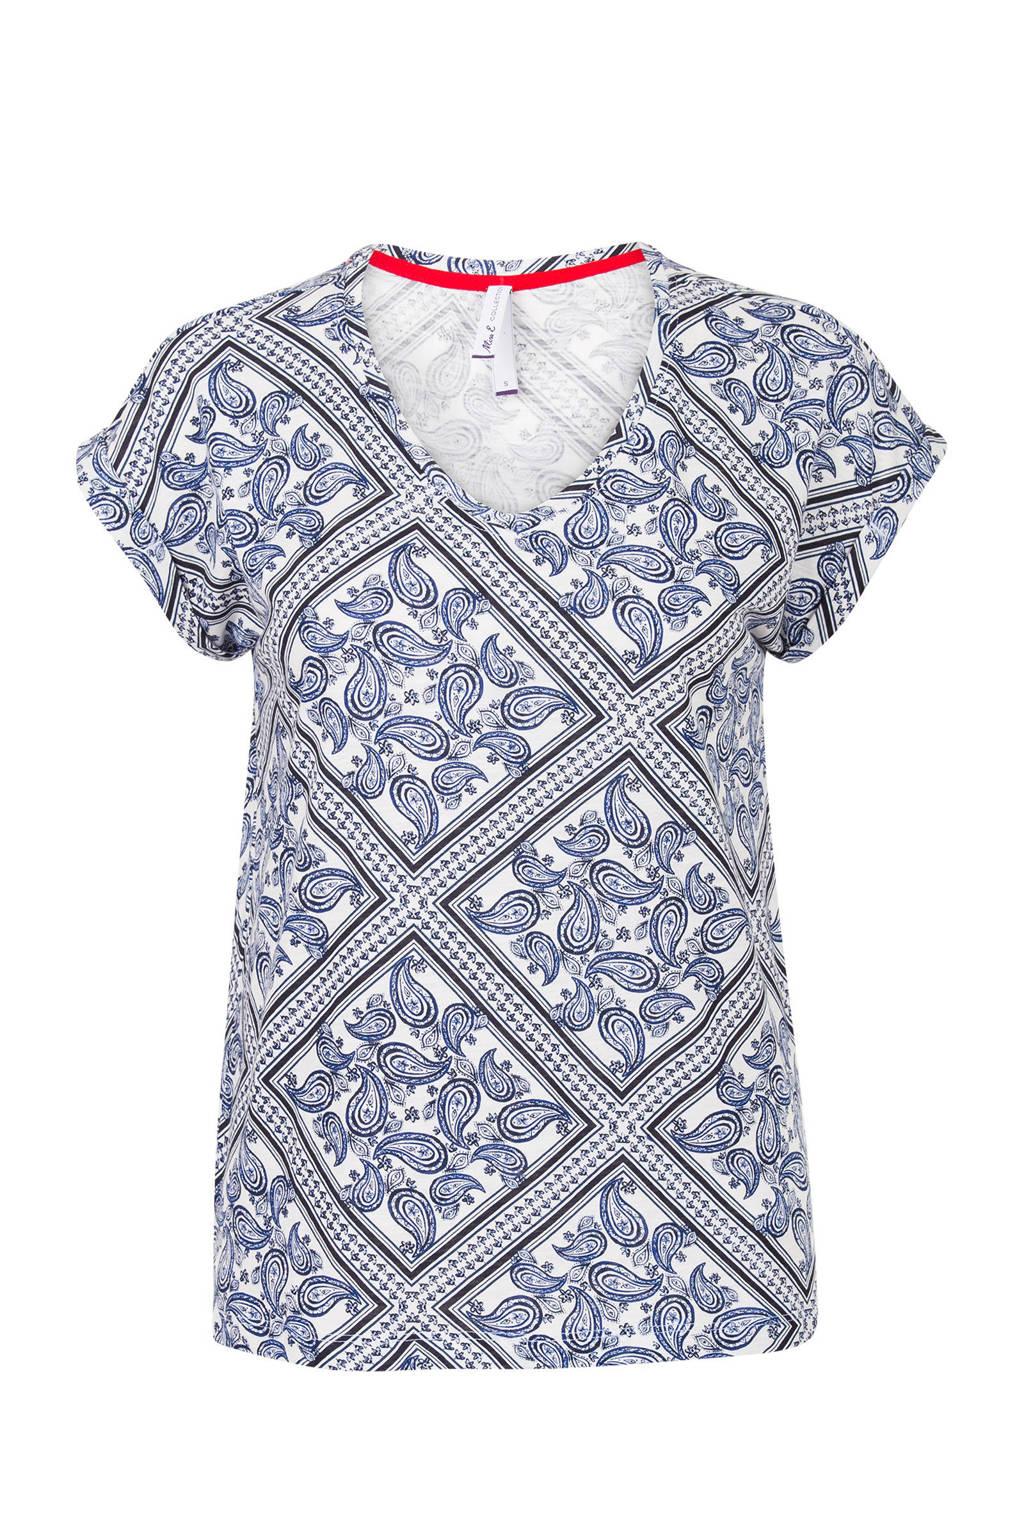 Miss Etam Regulier T-shirt met paisley print blauw, Blauw/wit